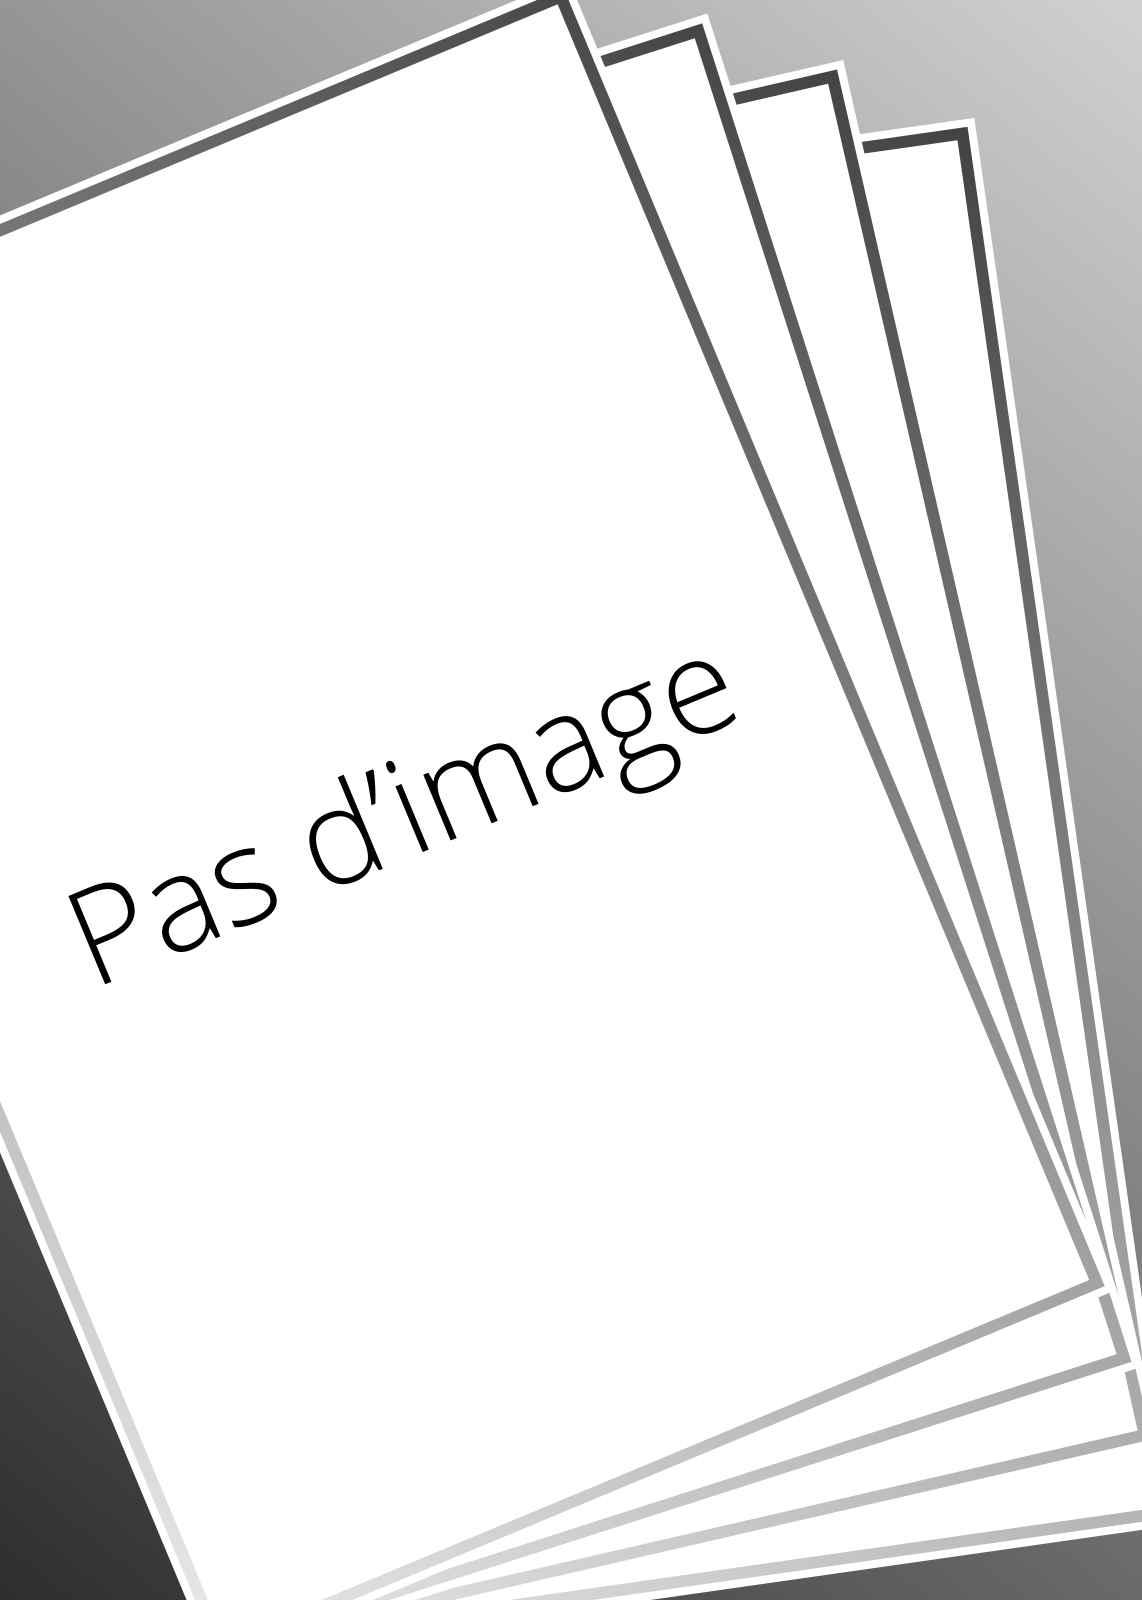 Bruneau - Photomontages Creatifs Avec Photoshop Ii Chahier N? 13 (Ts)